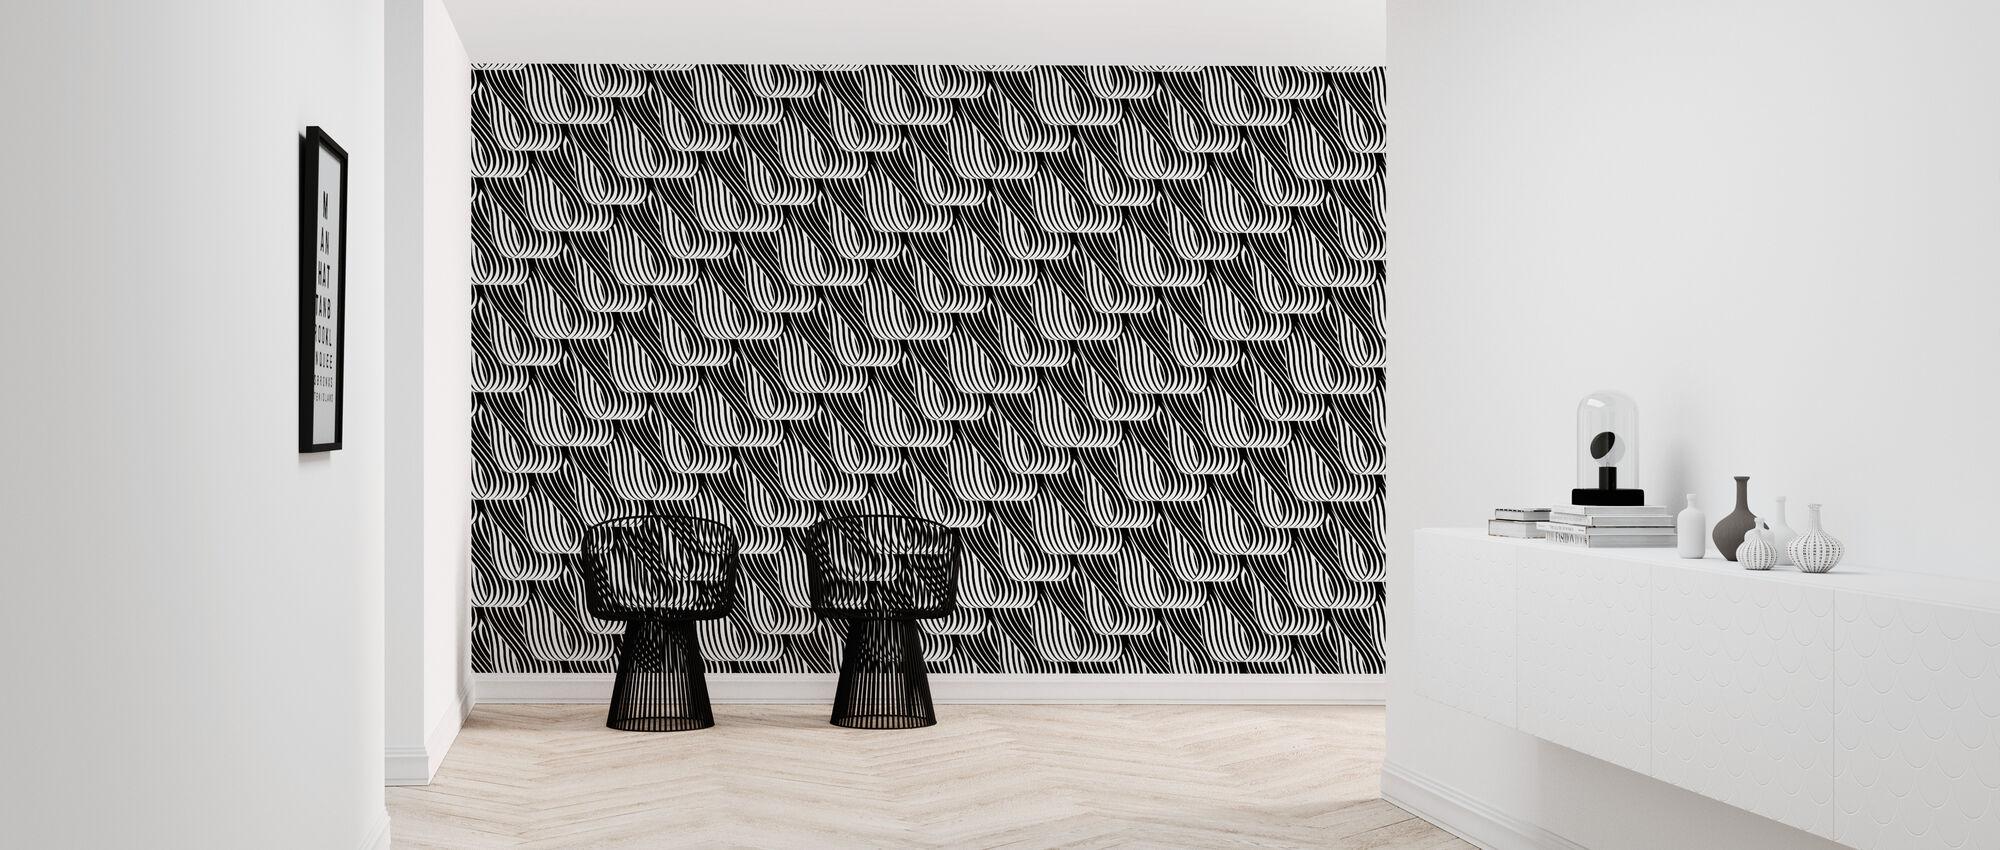 Ribbons - Wallpaper - Hallway